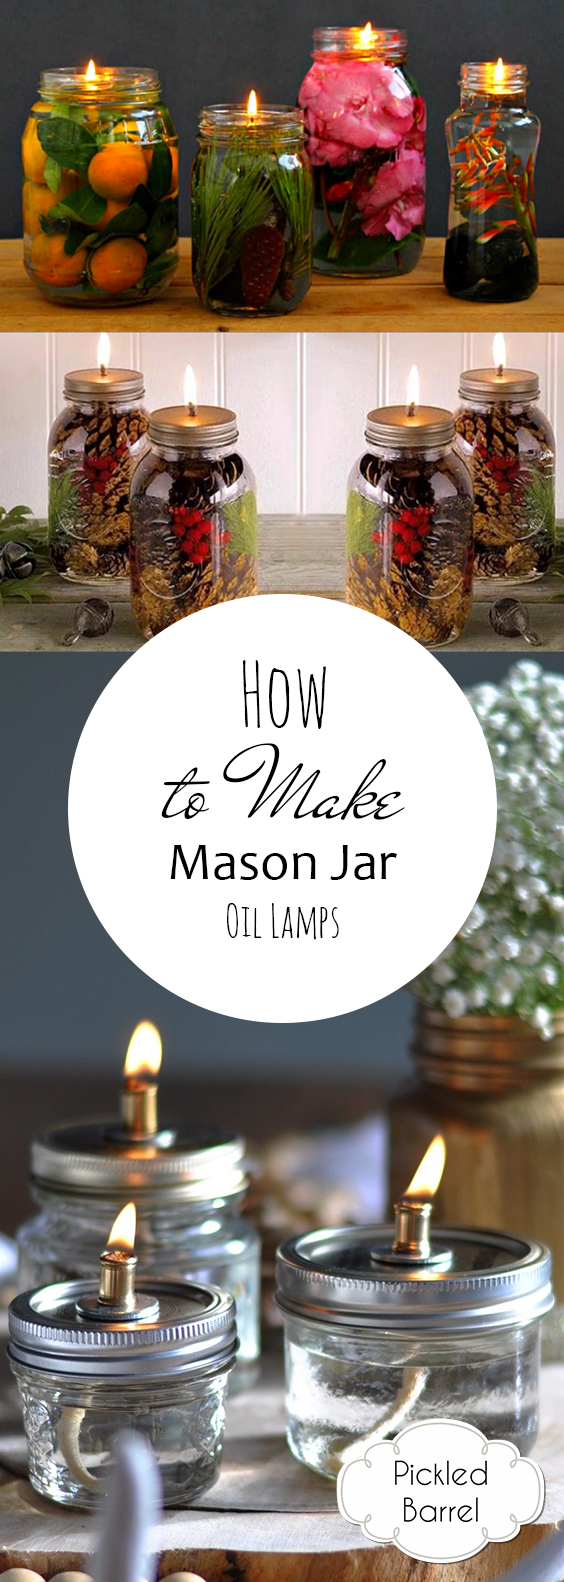 How To Make Mason Jar Oil Lamps| Mason Jar, Mason Jar Oil Lamps,